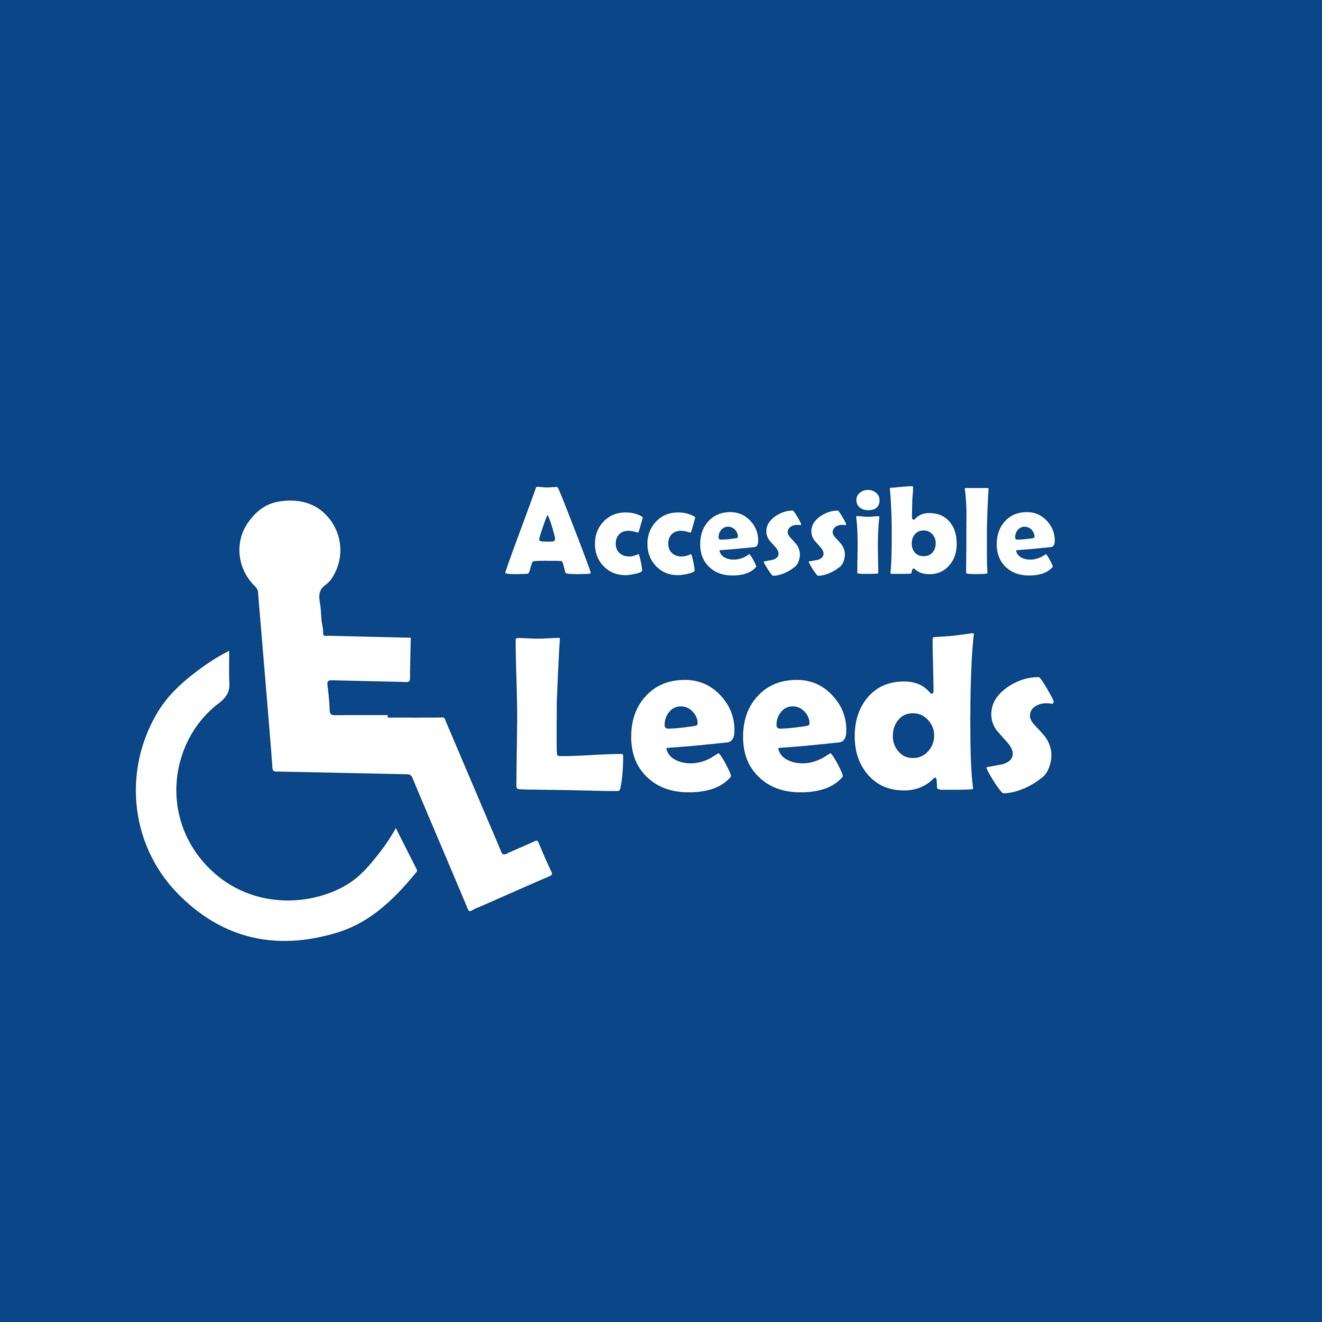 Accessible+Leeds+3-01.jpg